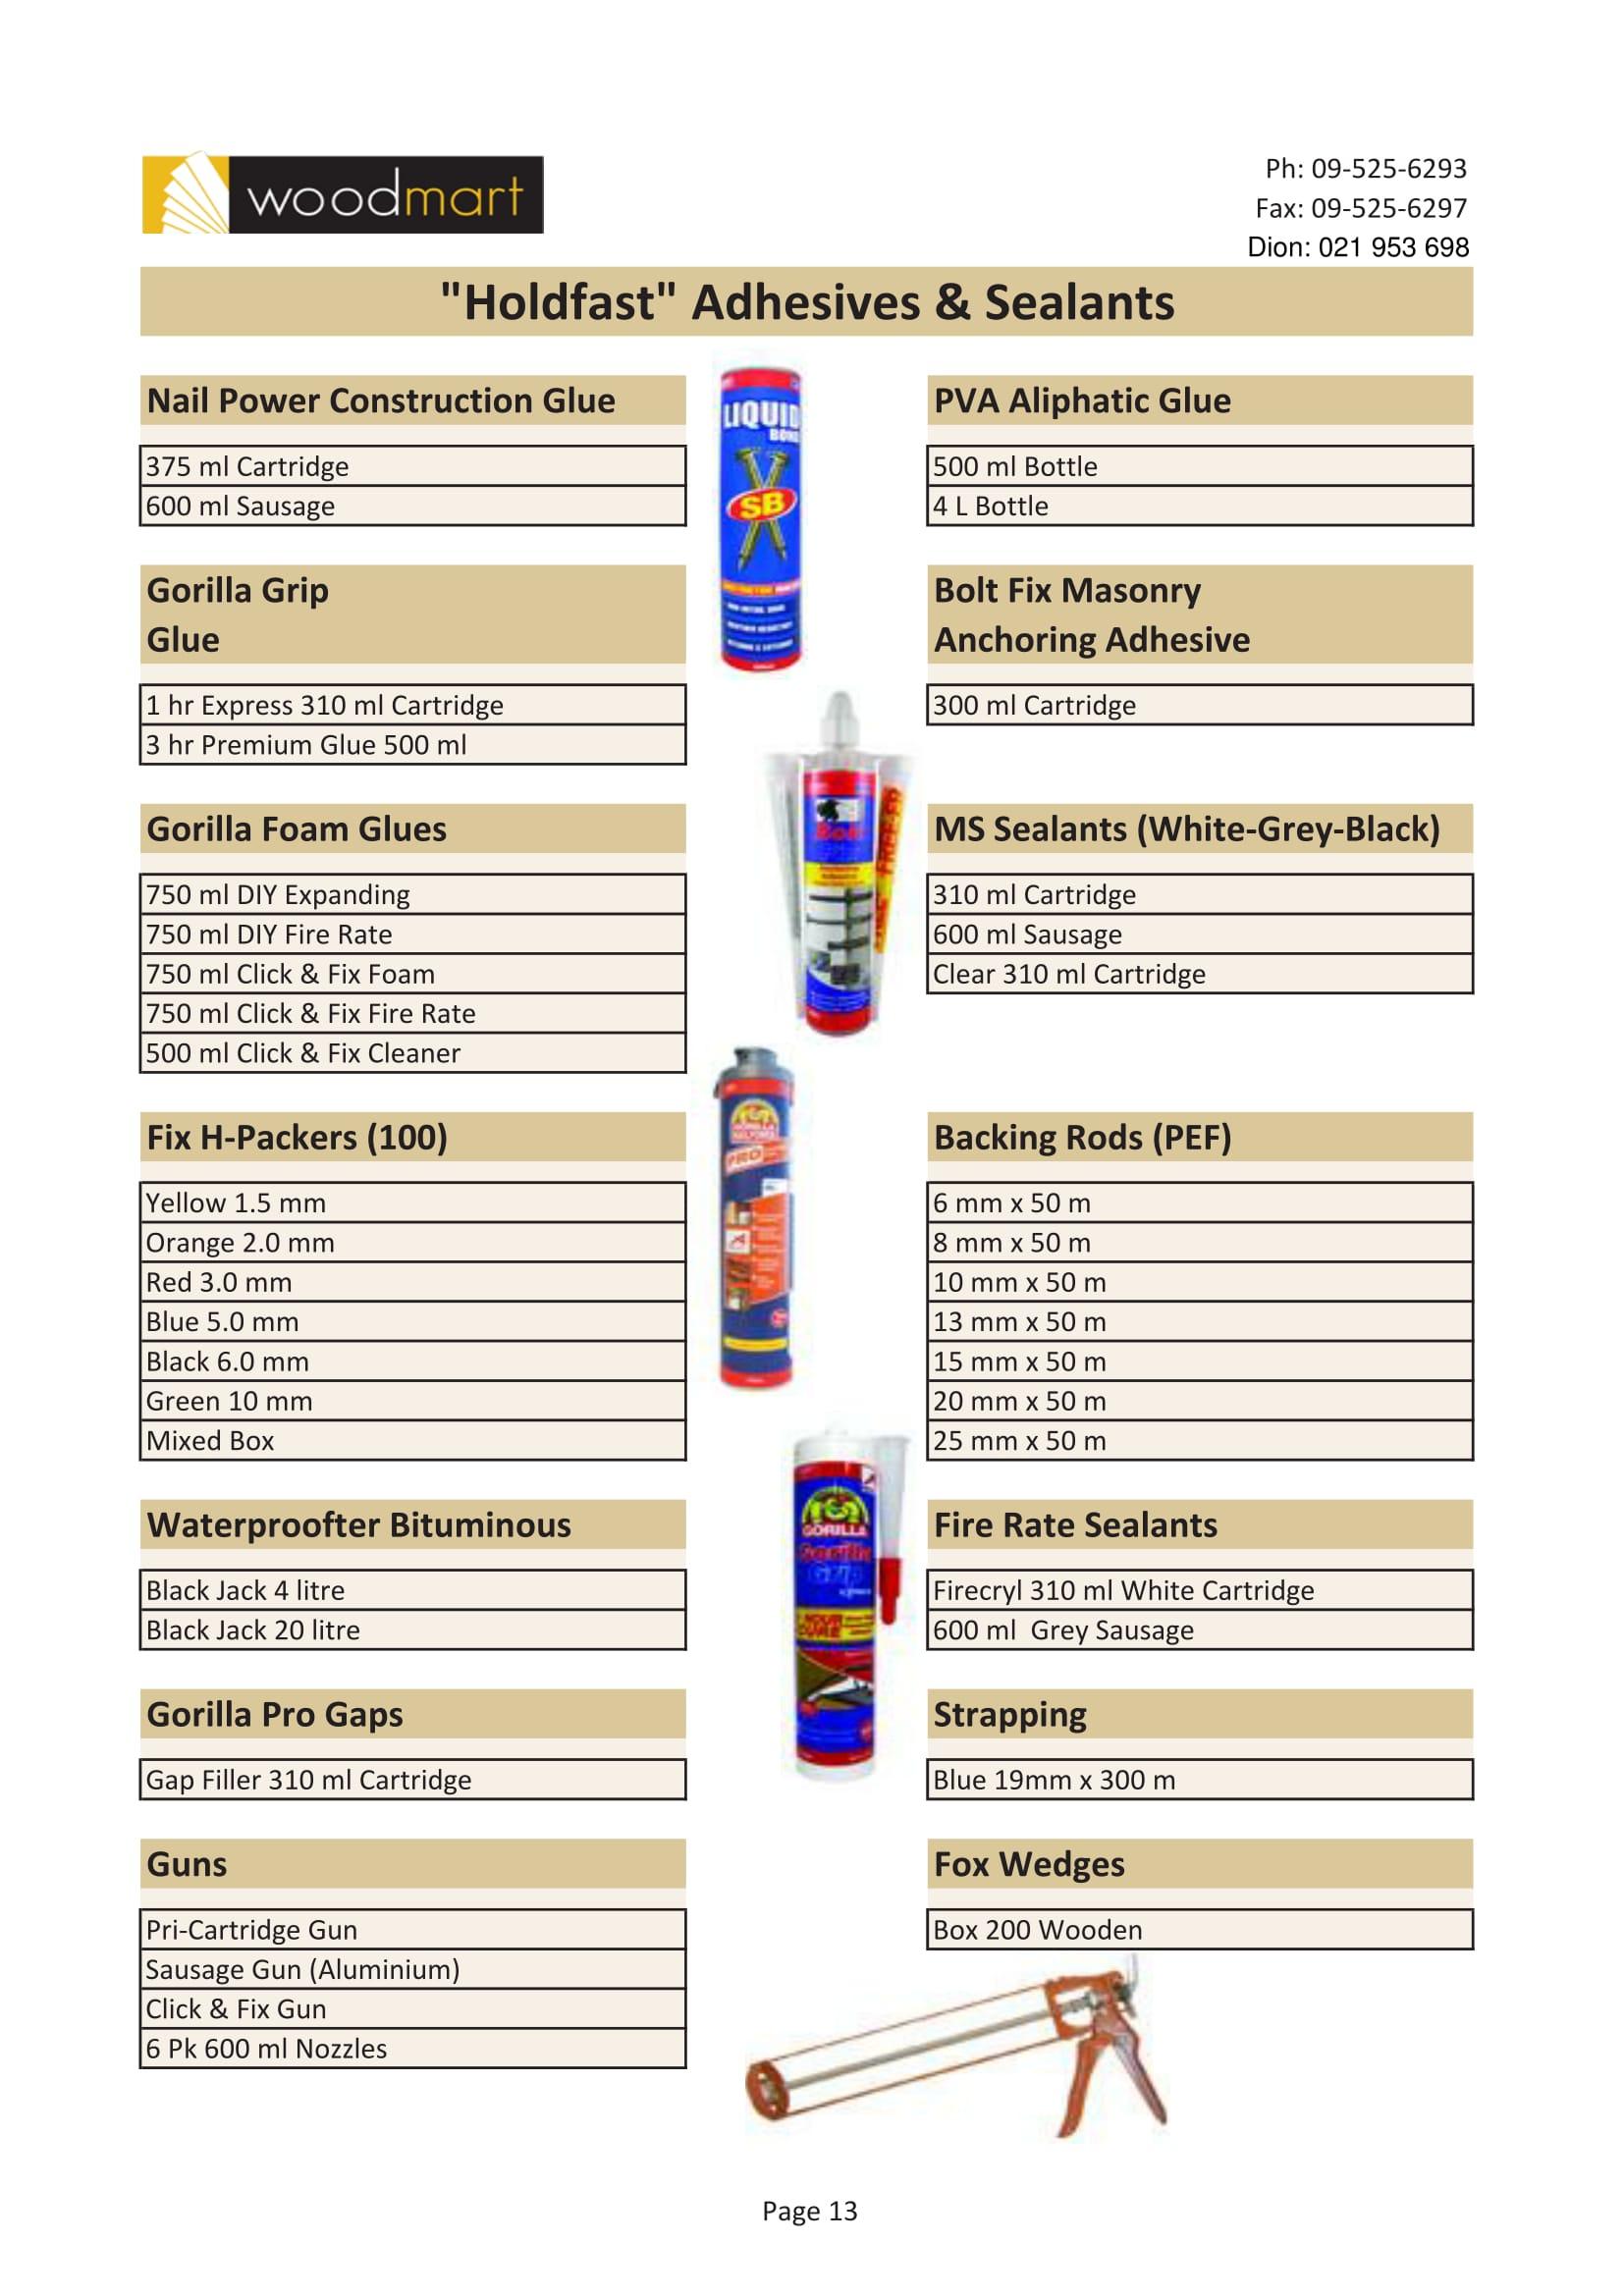 Holdfast Adhesives & Sealants